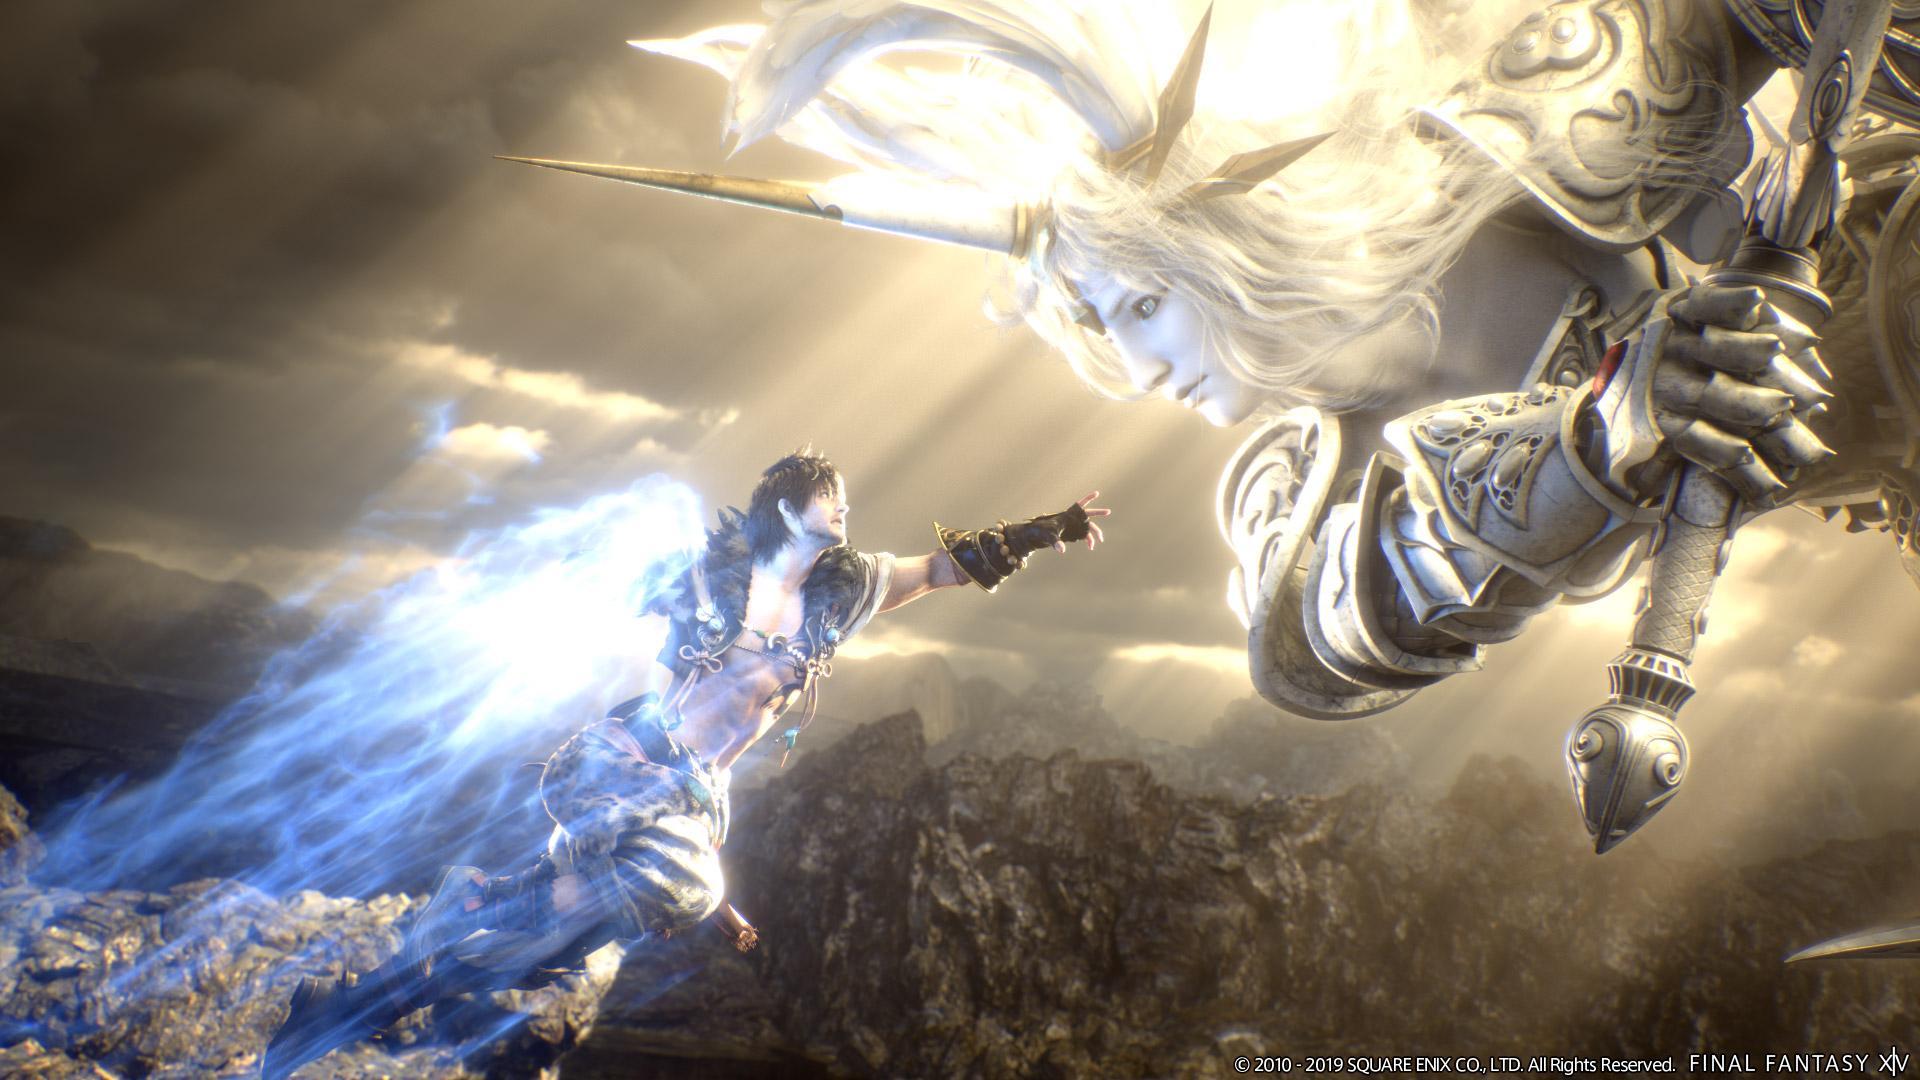 Final Fantasy XIV: Shadow Bringers Wallpapers - Wallpaper Cave